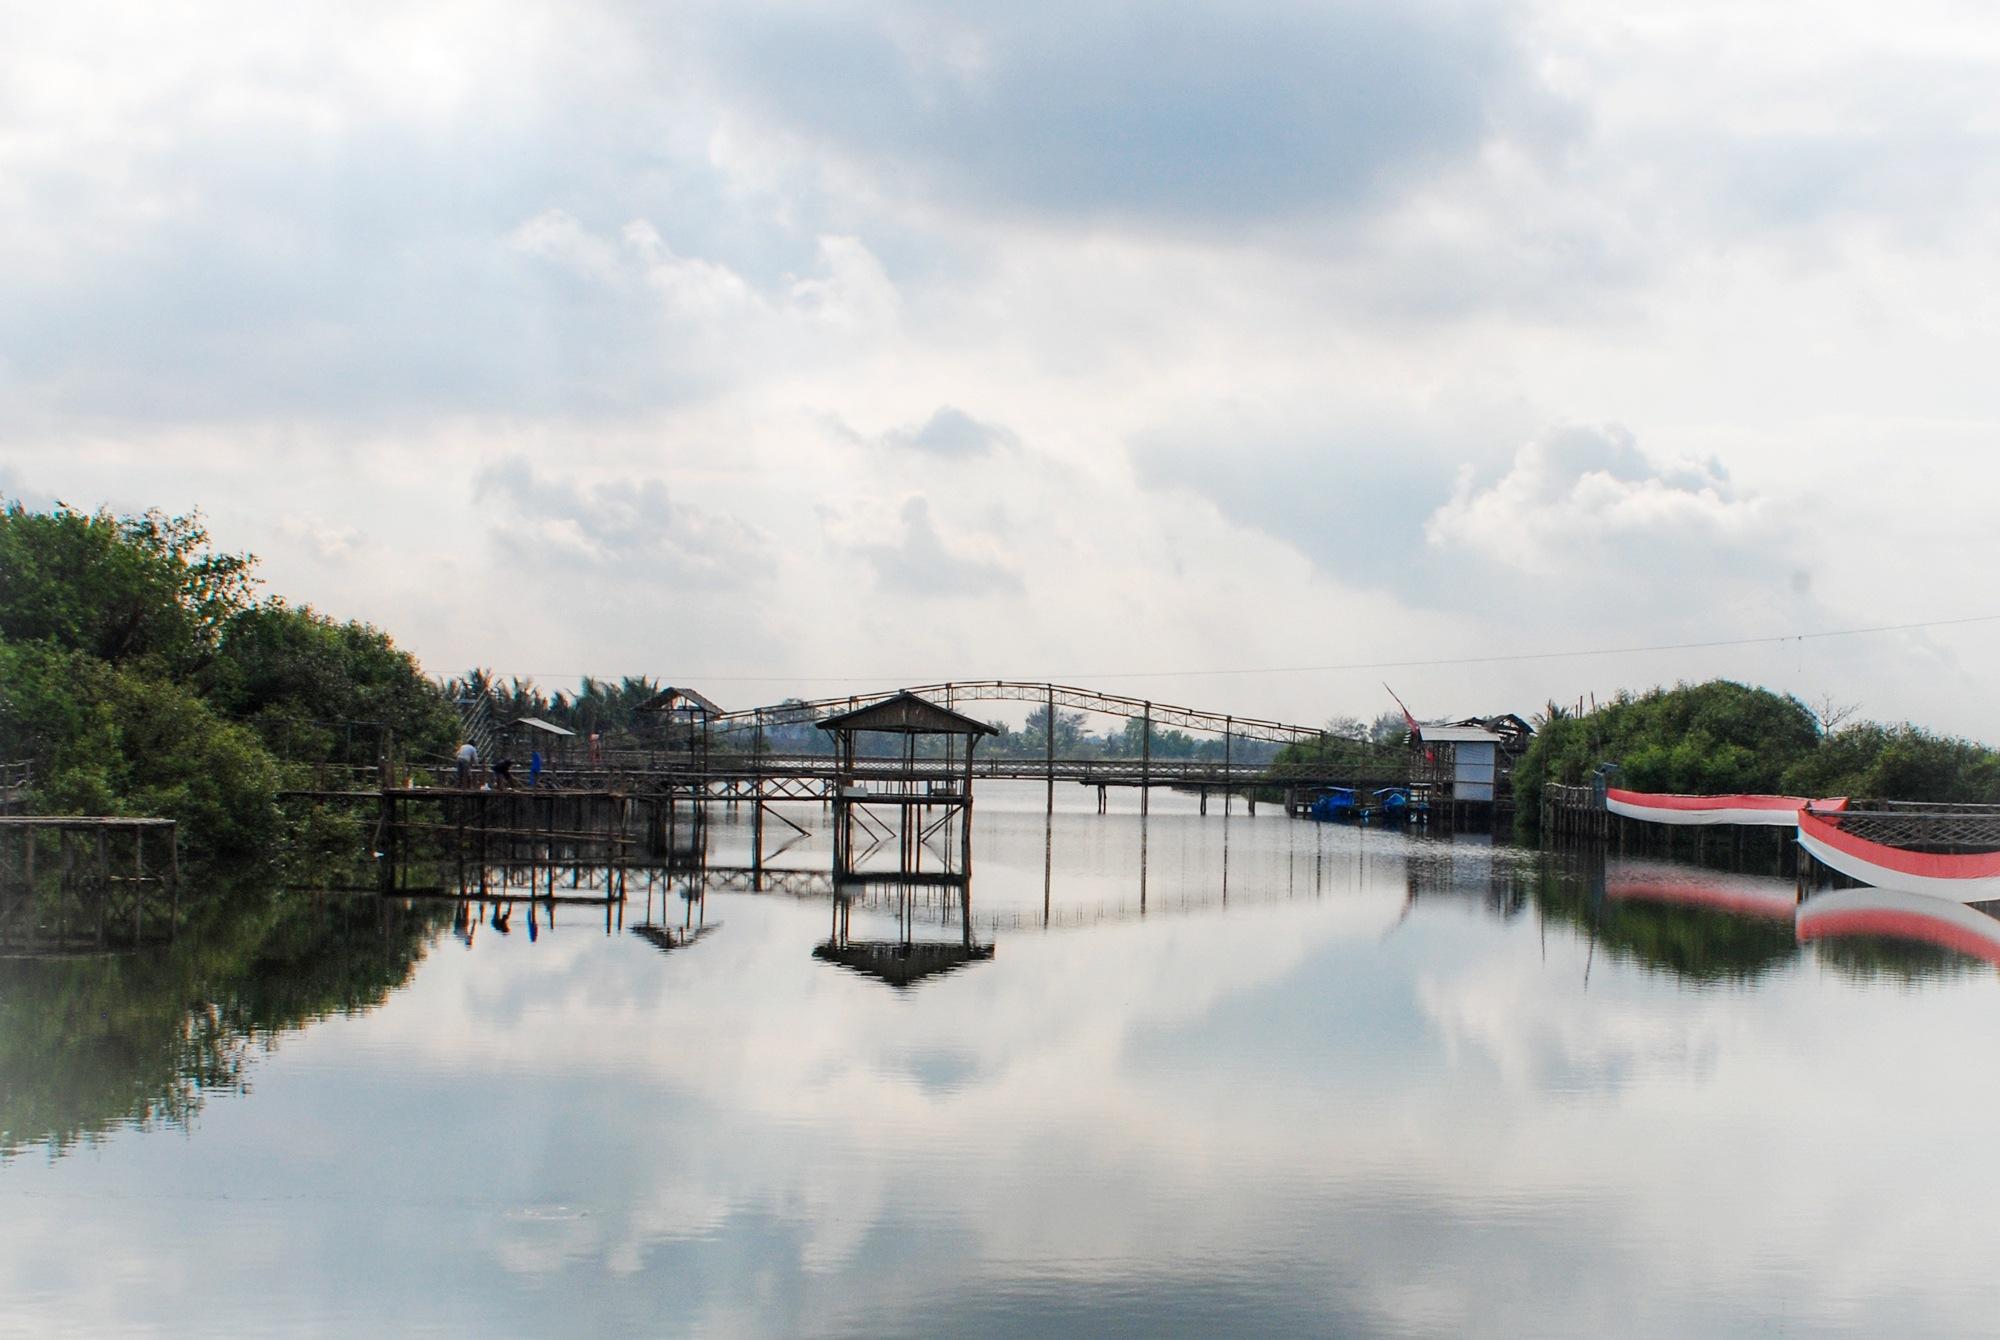 jembatan bambu... mangrove Kulon progo, Jogjakarta by KawanGS